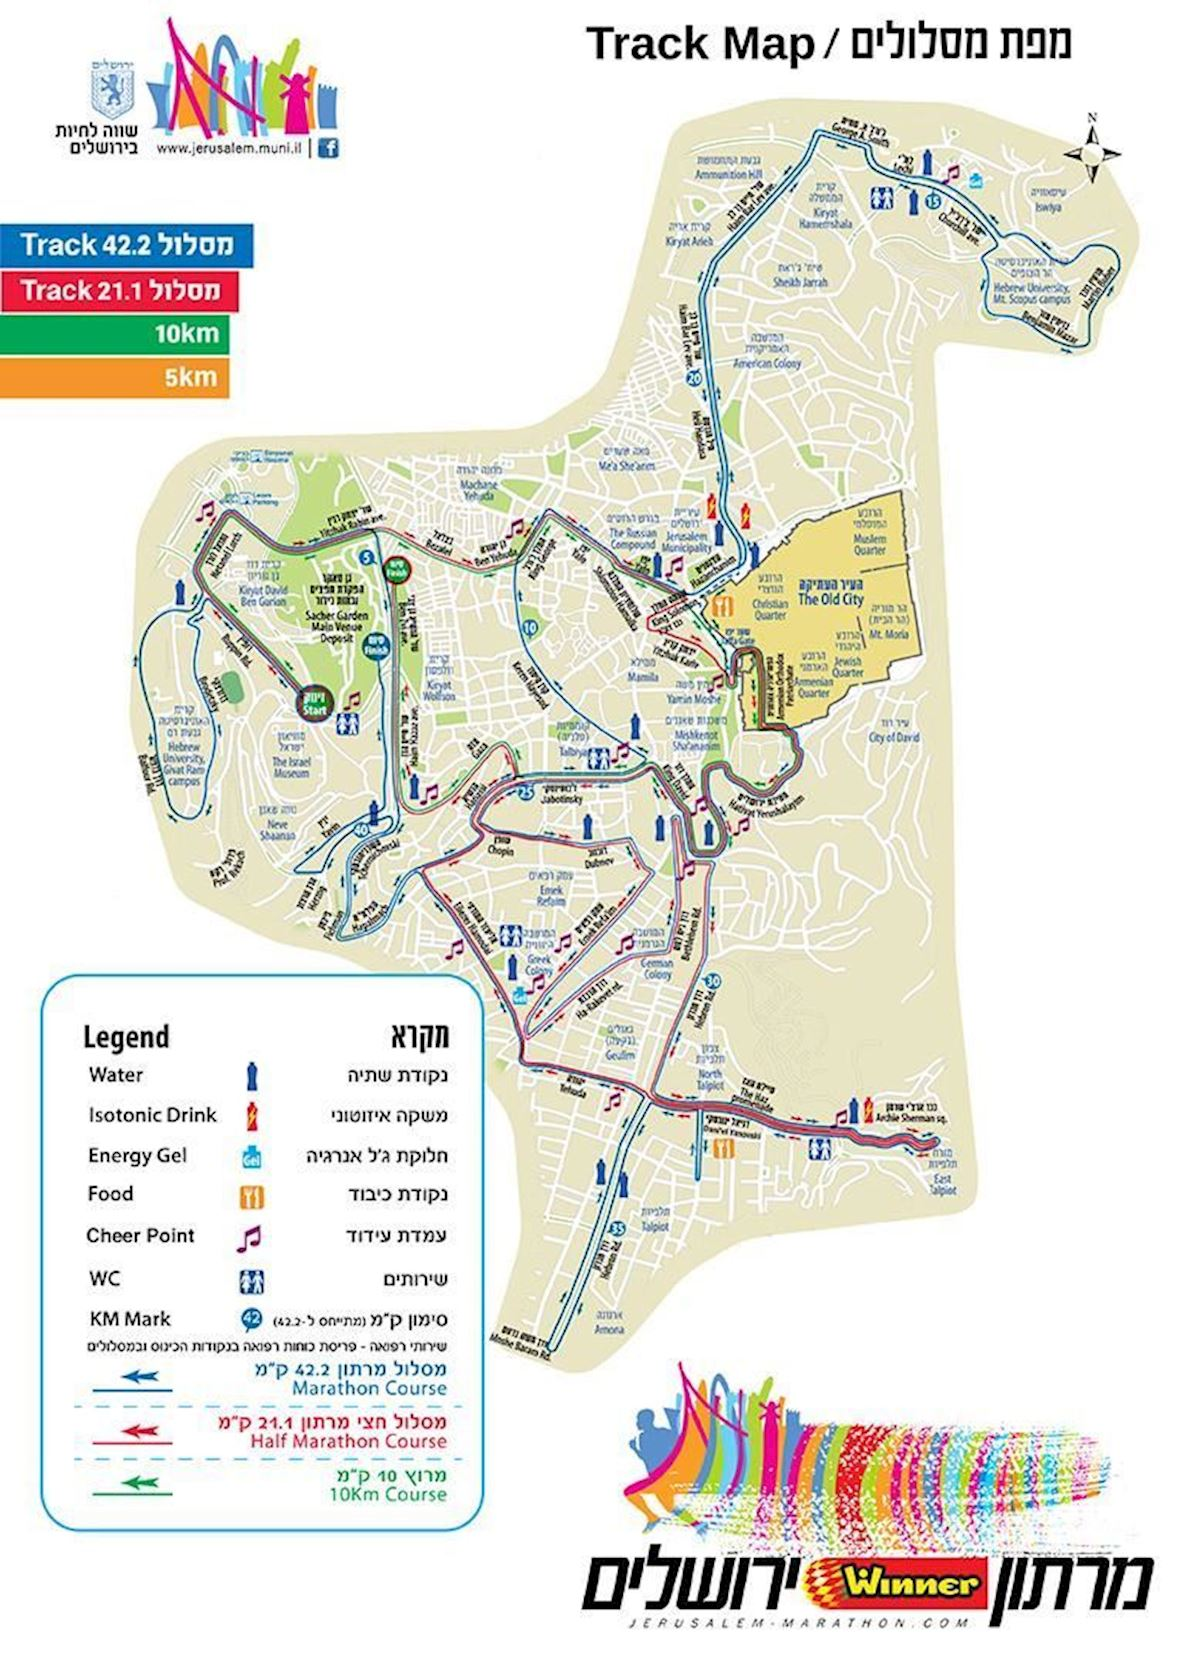 Jerusalem Marathon MAPA DEL RECORRIDO DE